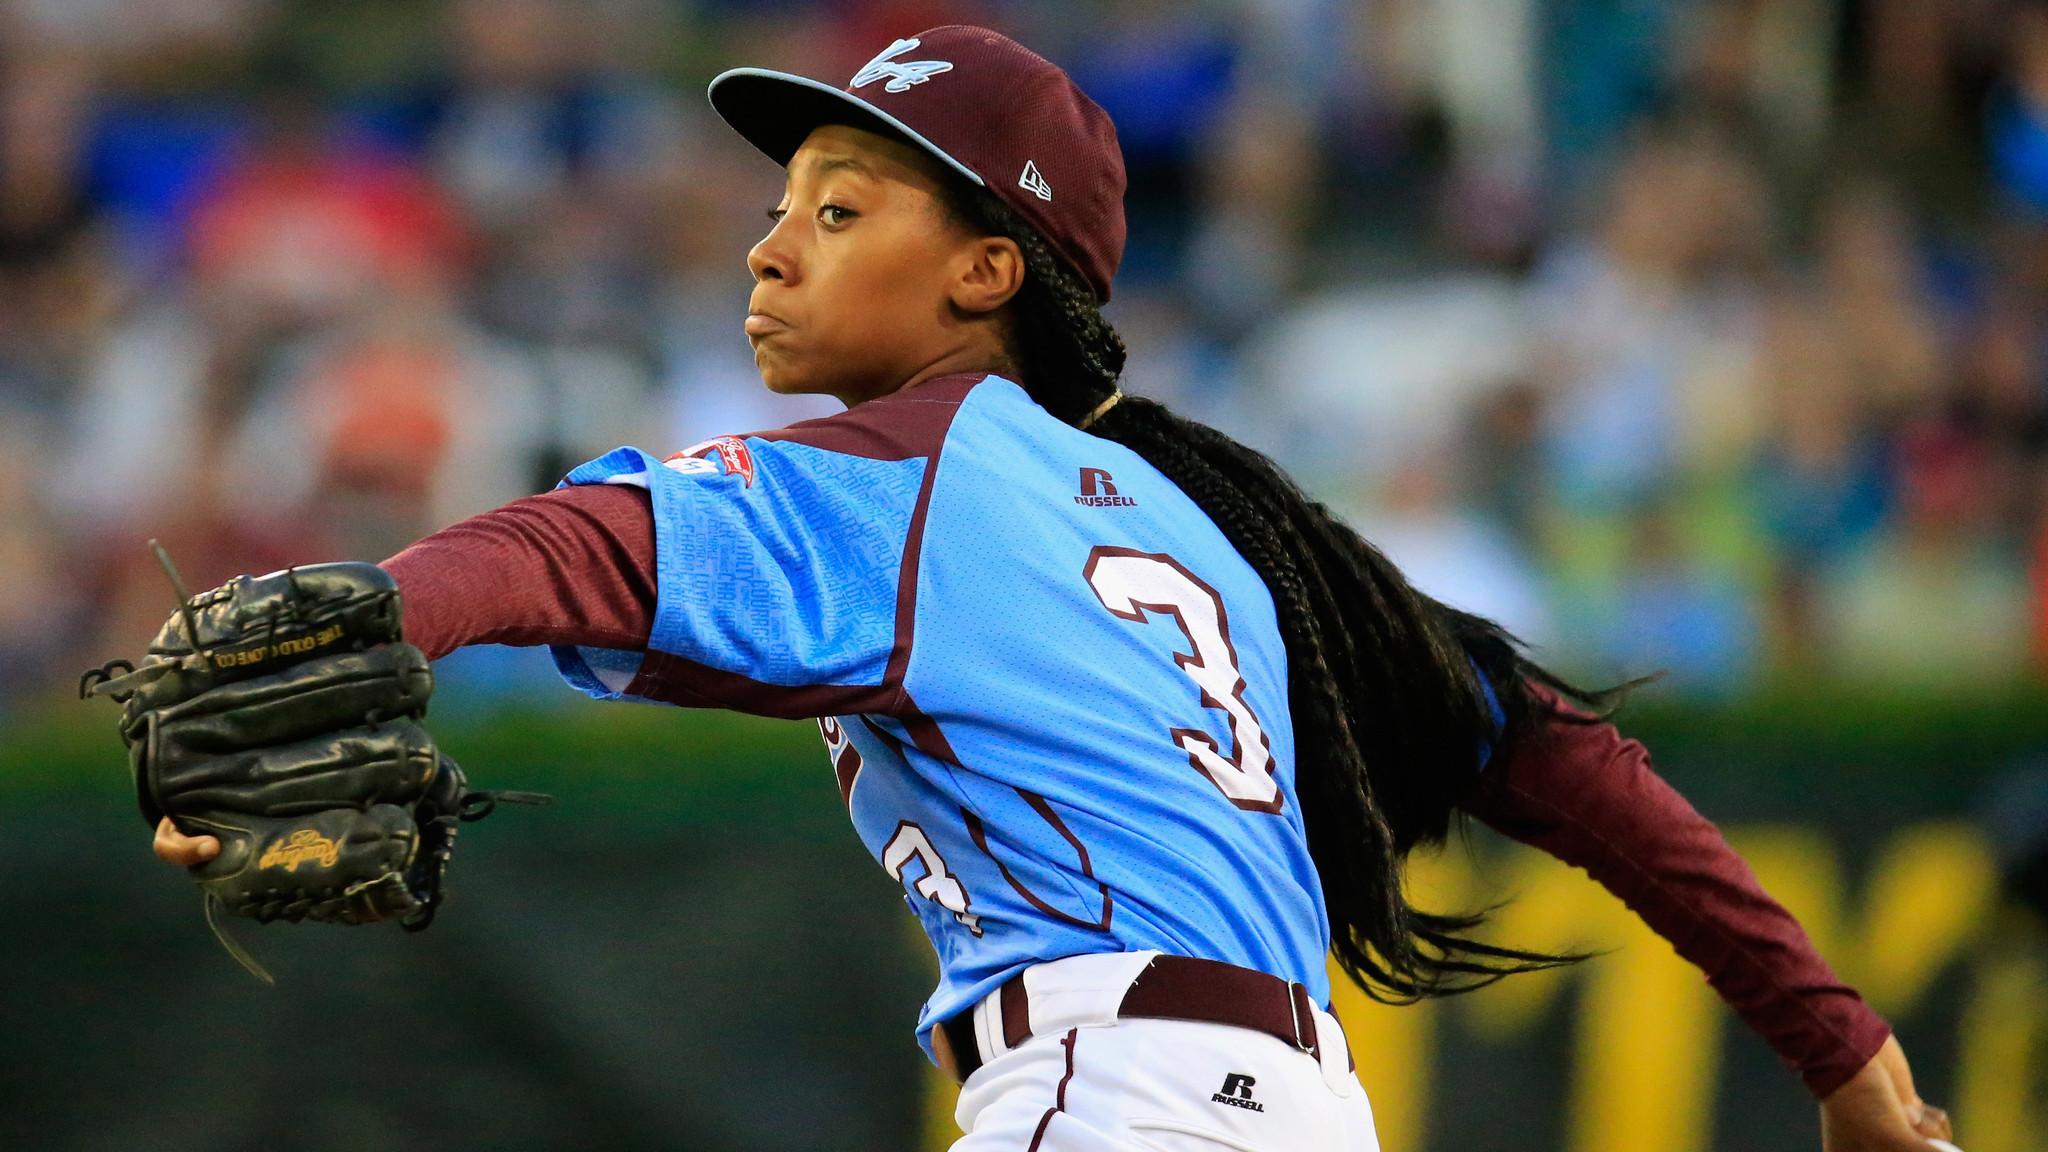 Mo'Ne Davis and Philadelphia lose at Little League World Series